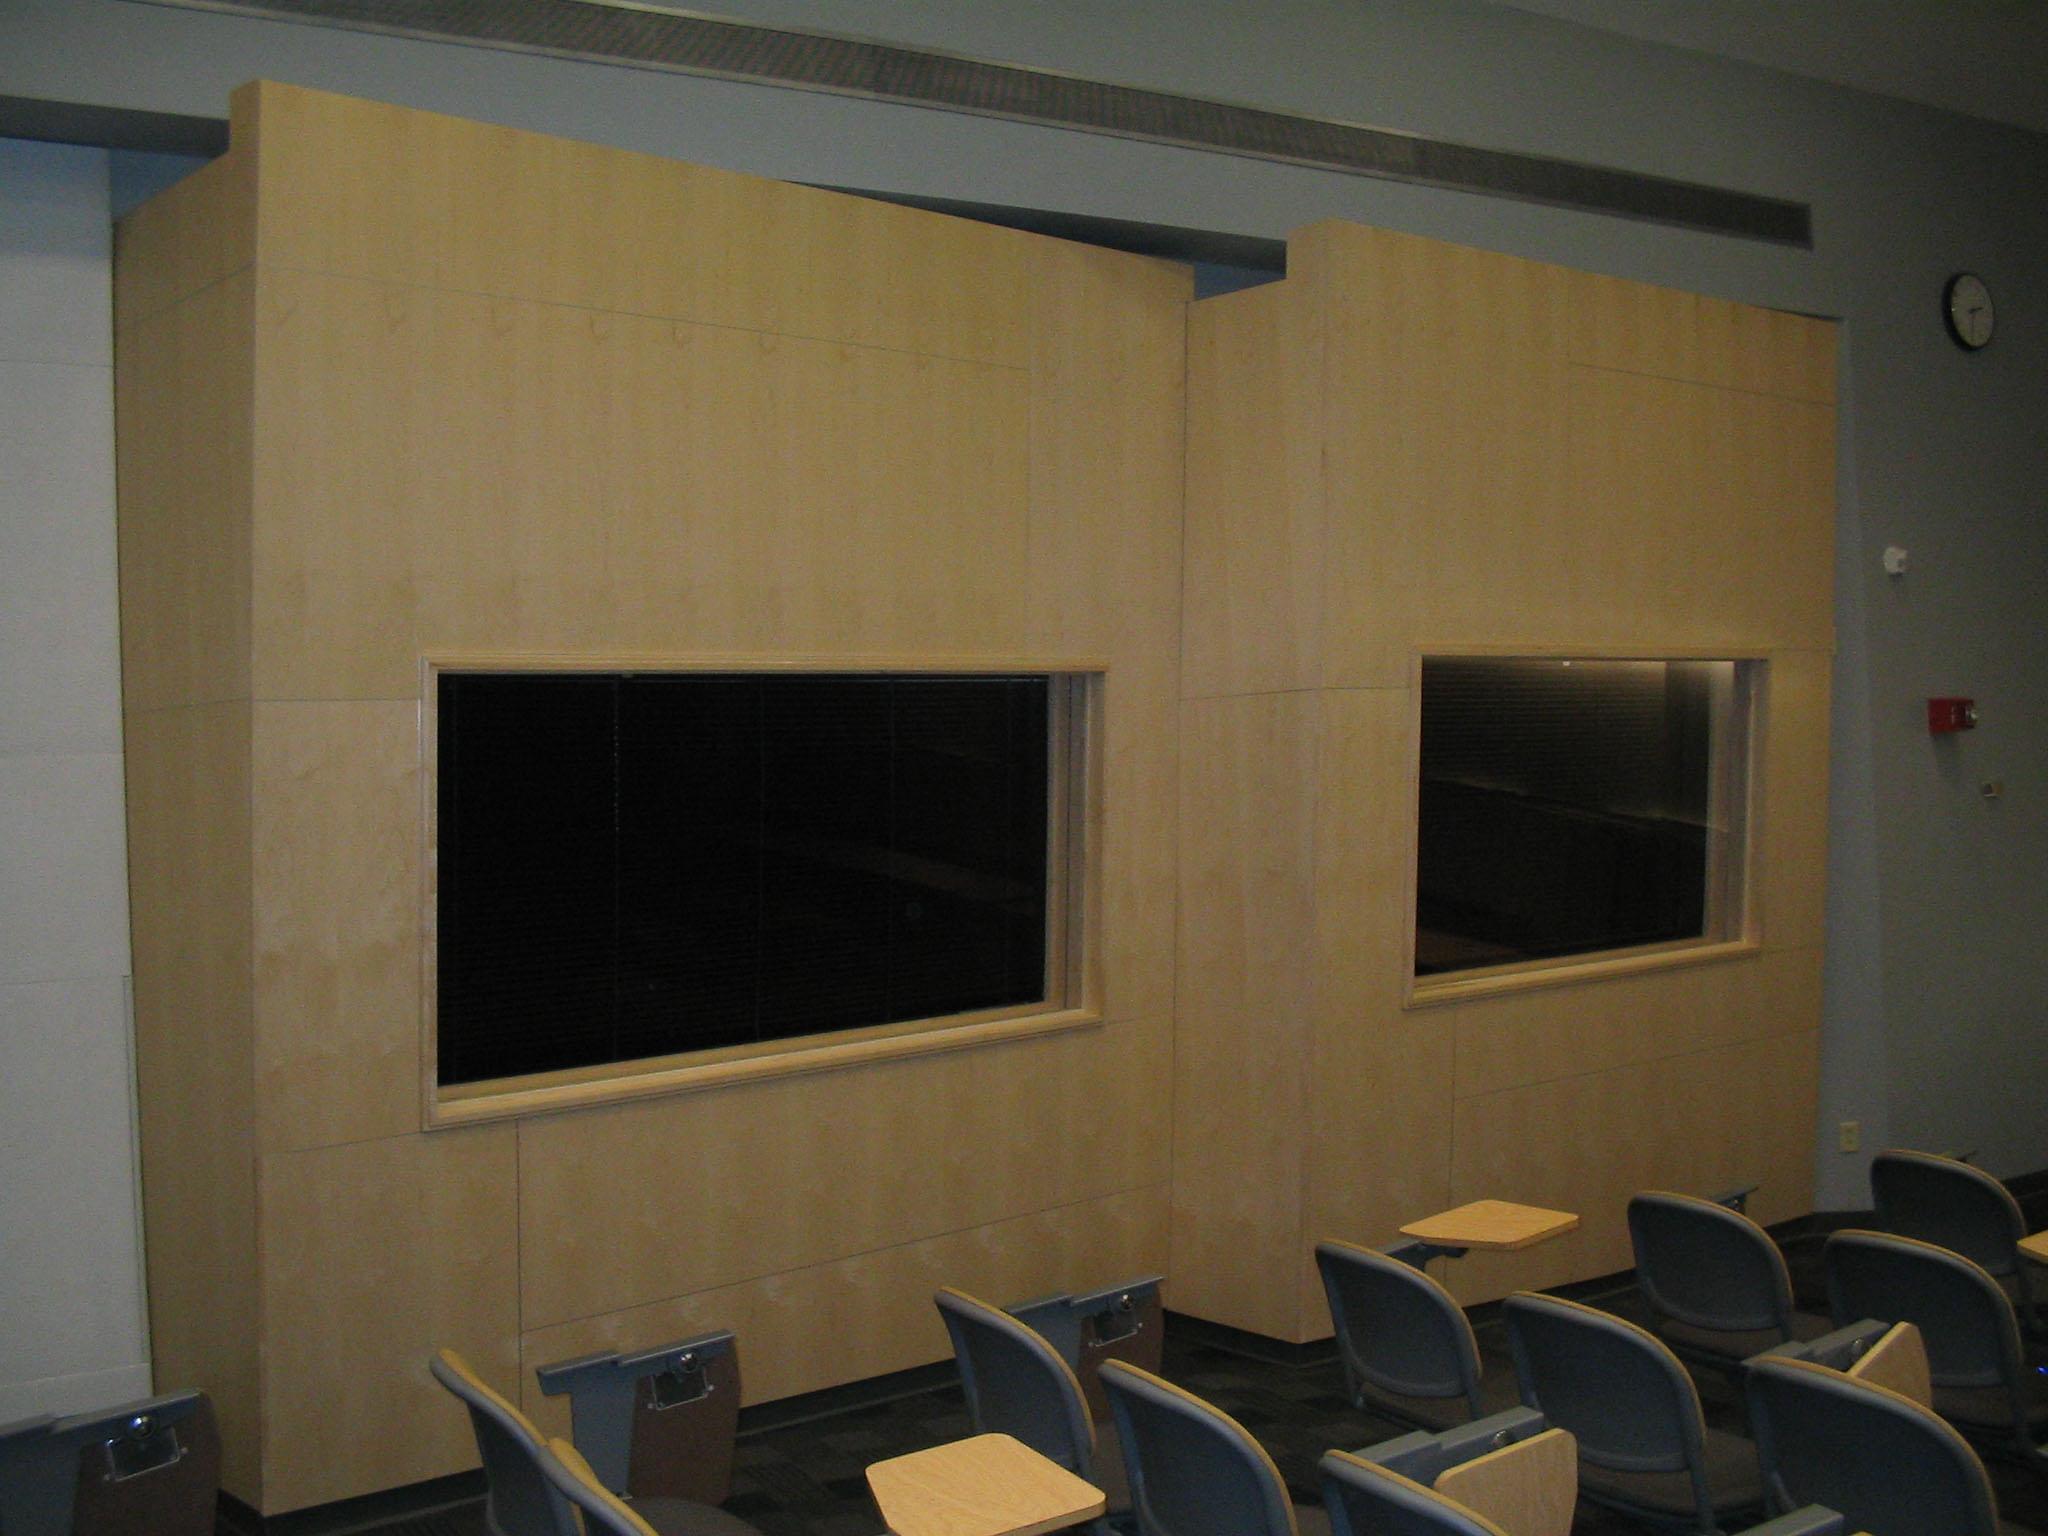 uwm-classroom-5